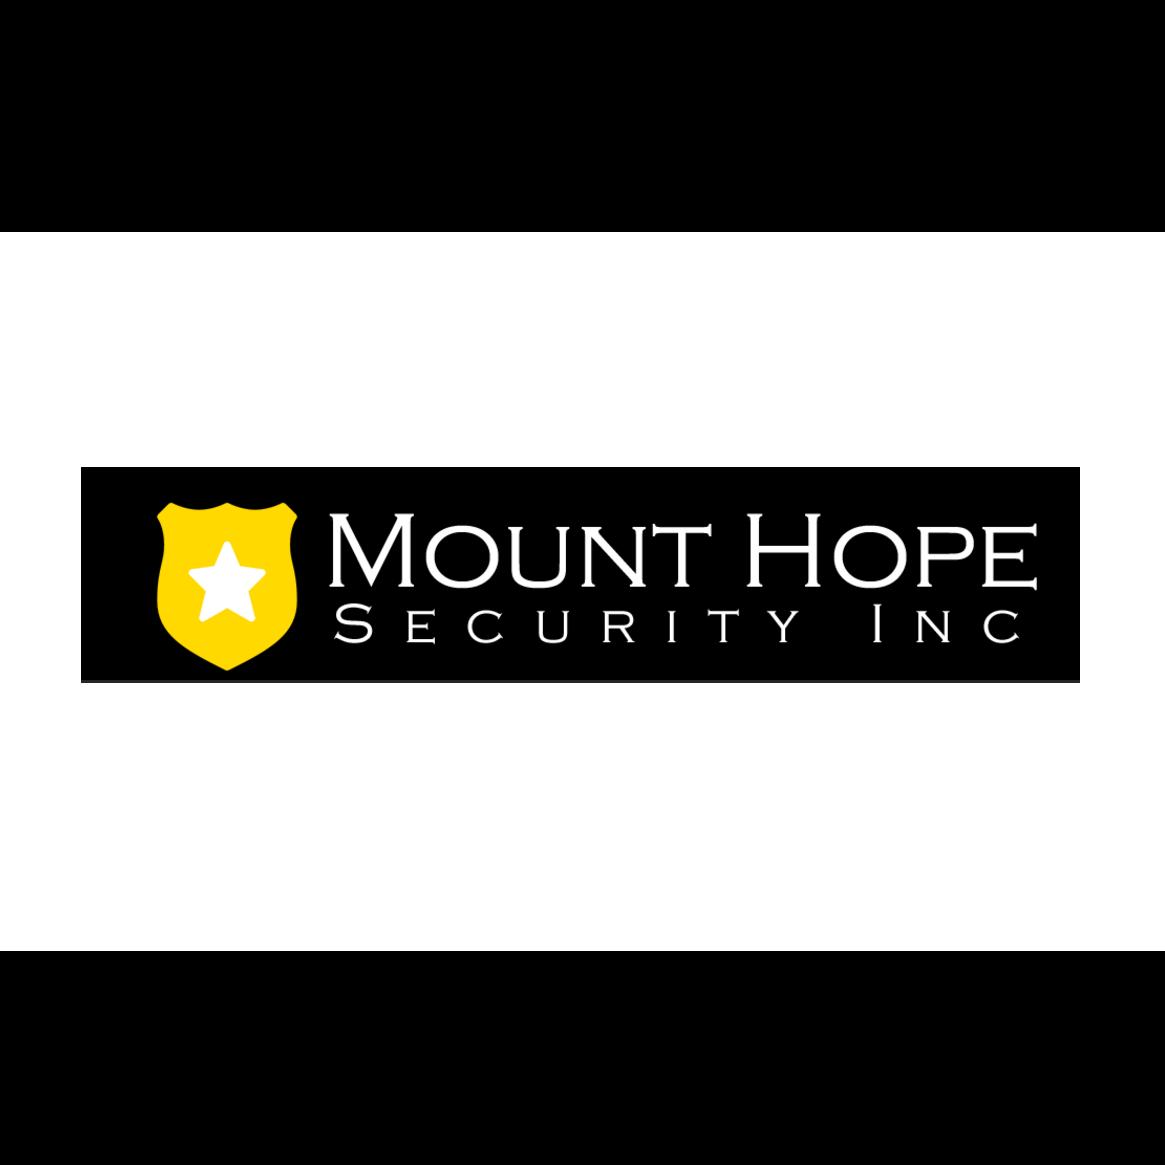 Mount Hope Security Inc